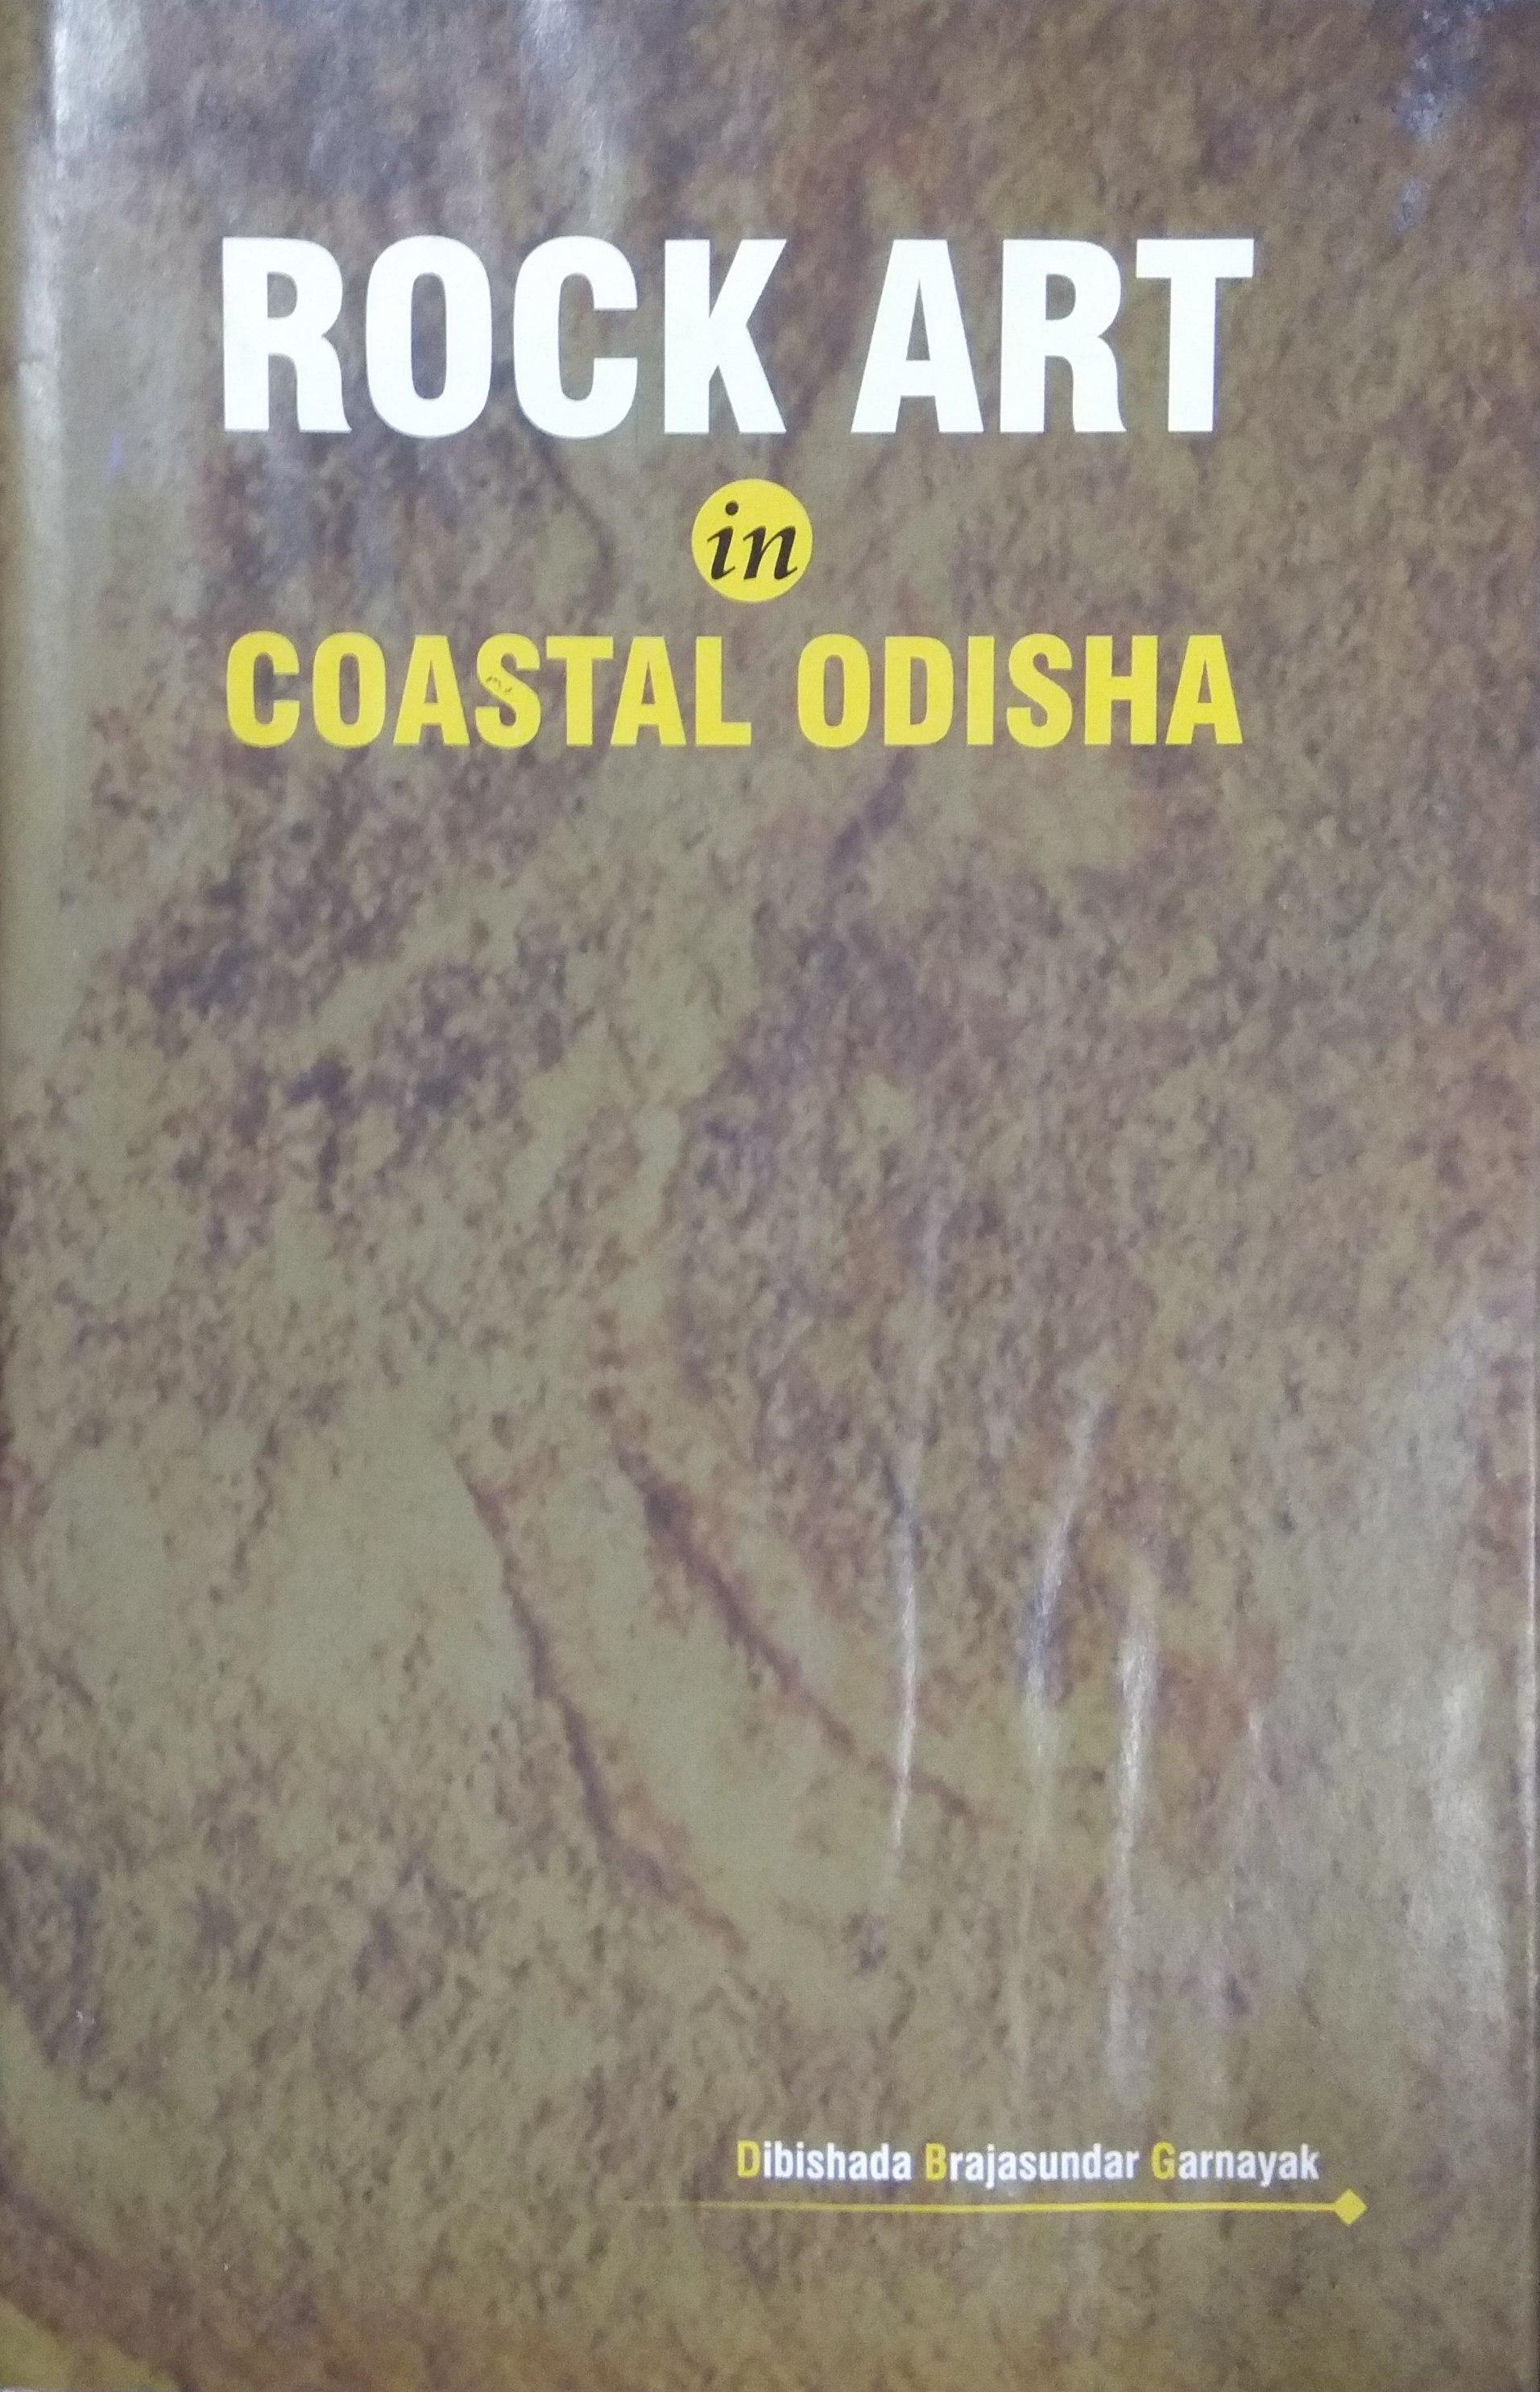 Rock Art in Coastal Odisha